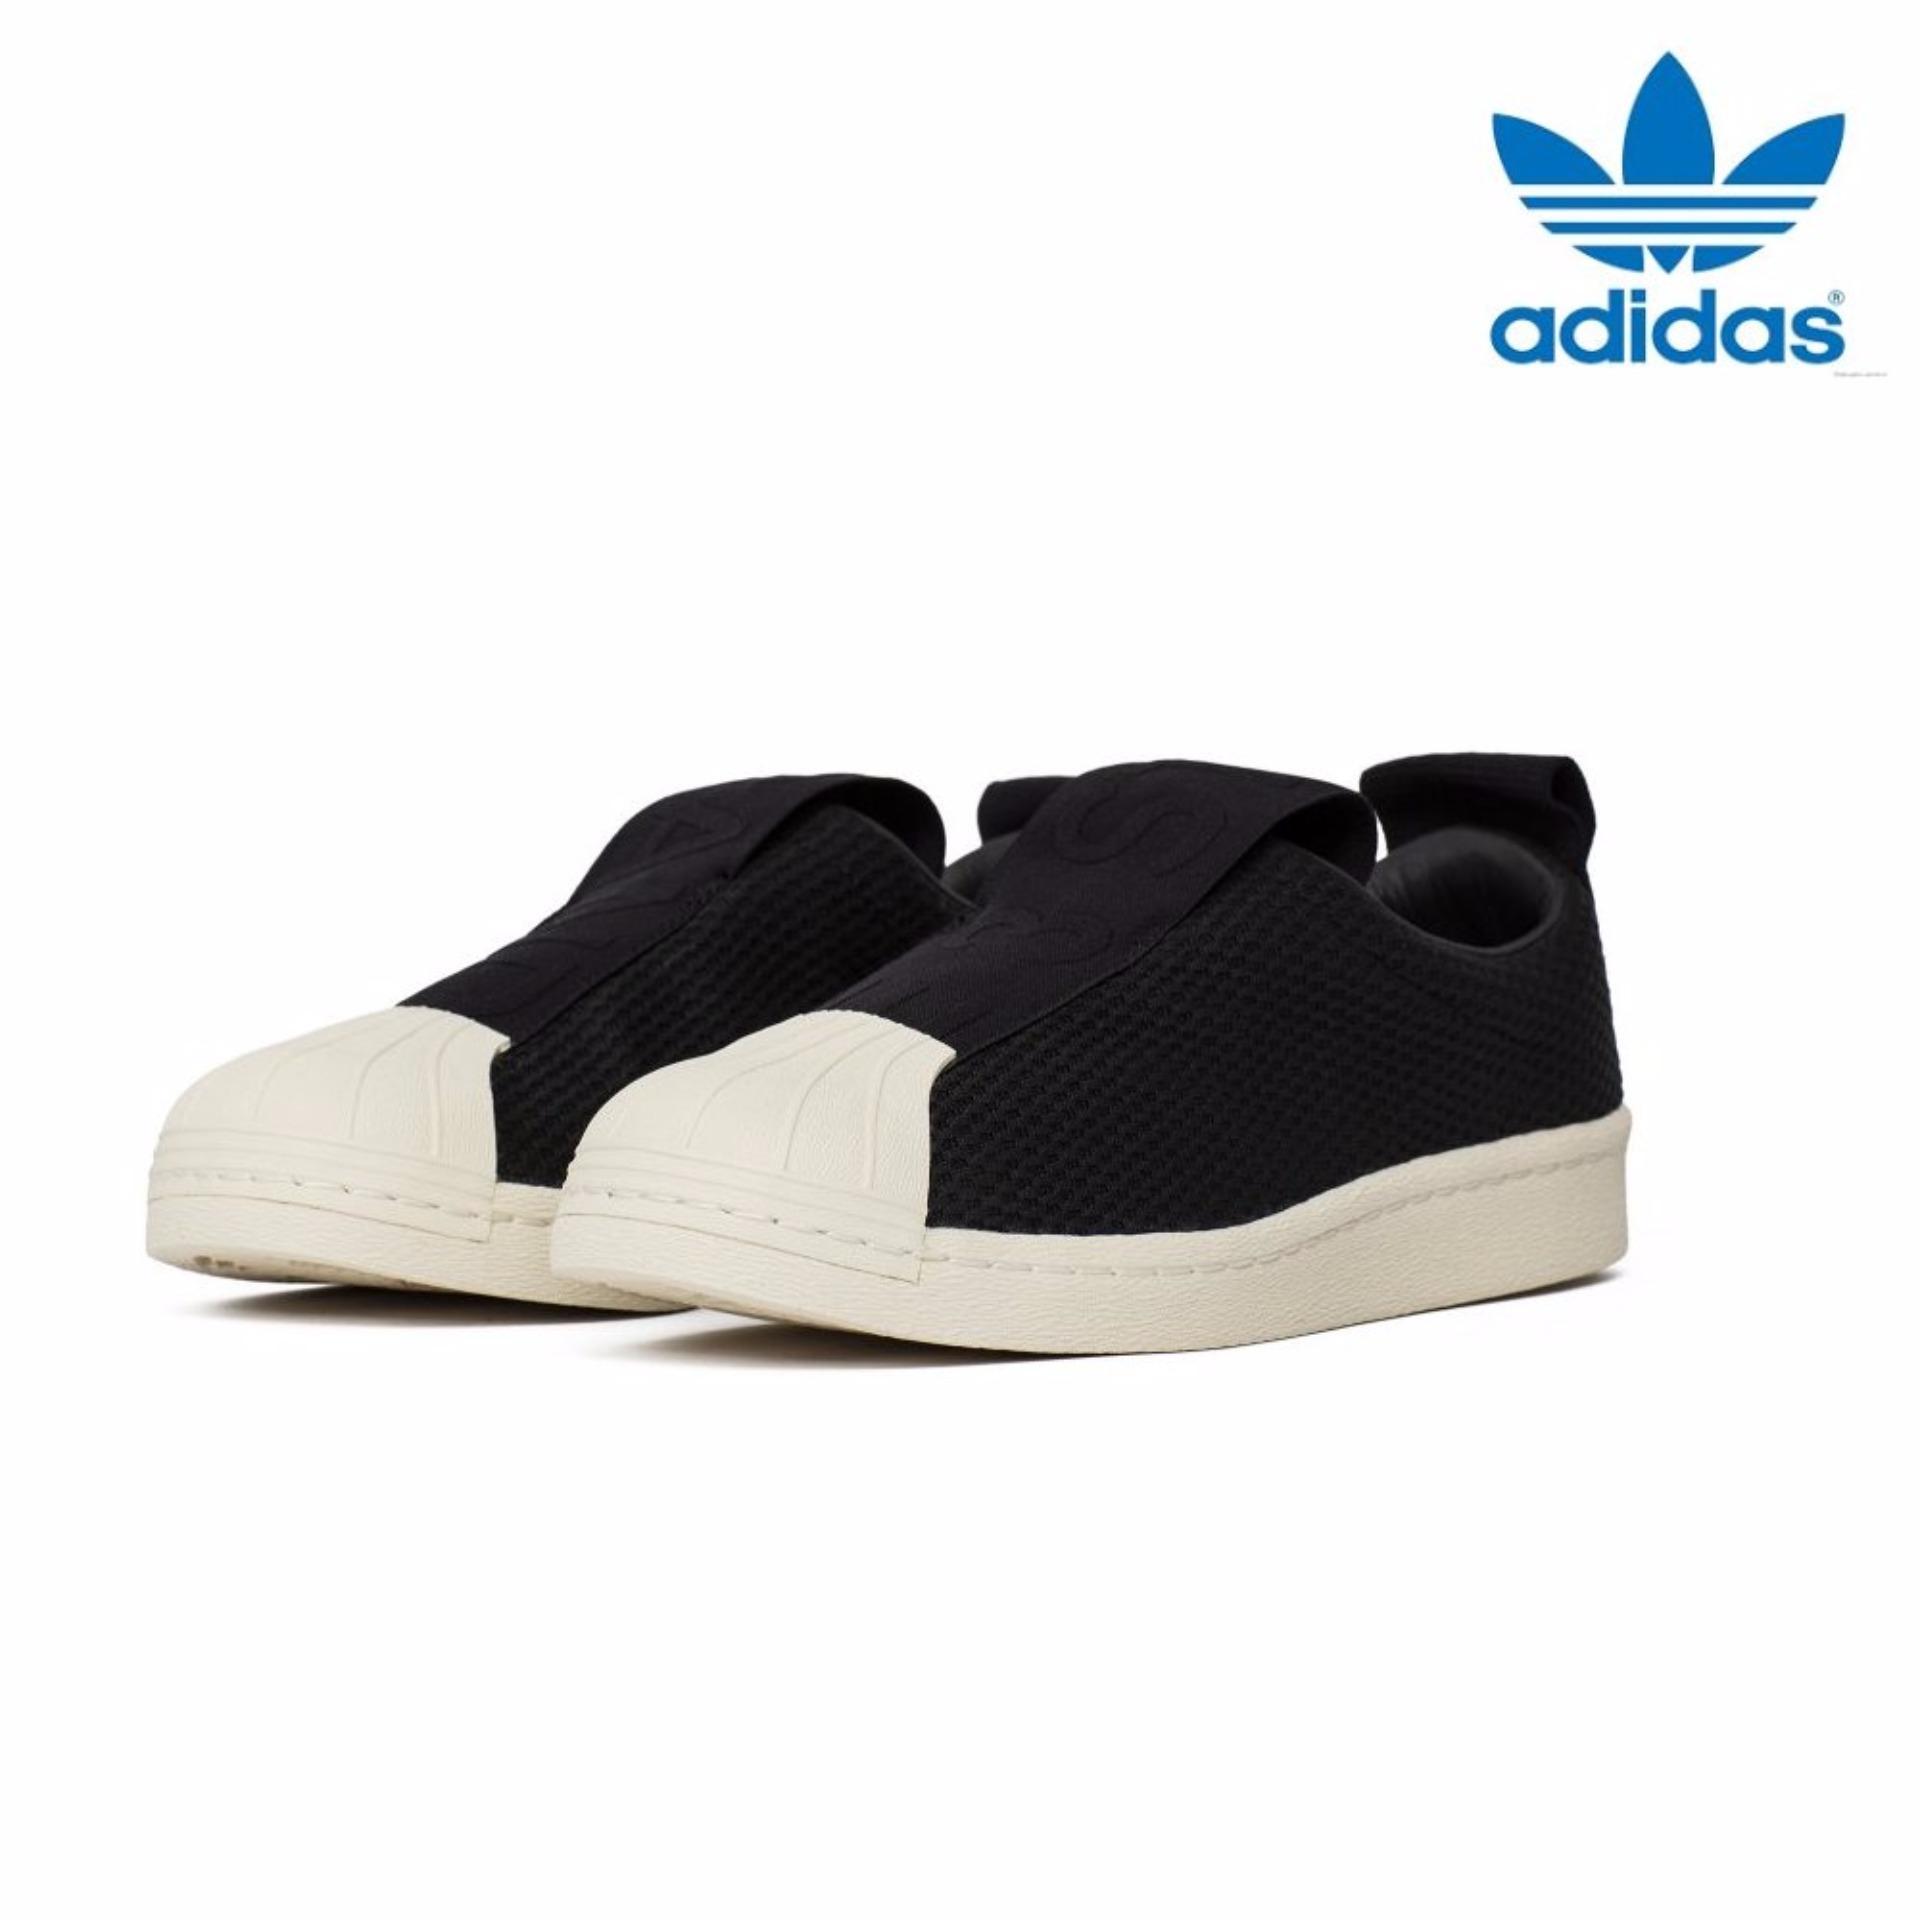 A bordo Finito pimienta  Adidas New Originals Superstar BW3S Slip-On Shoes BY9137 Core Black - intl  | Shopee Singapore